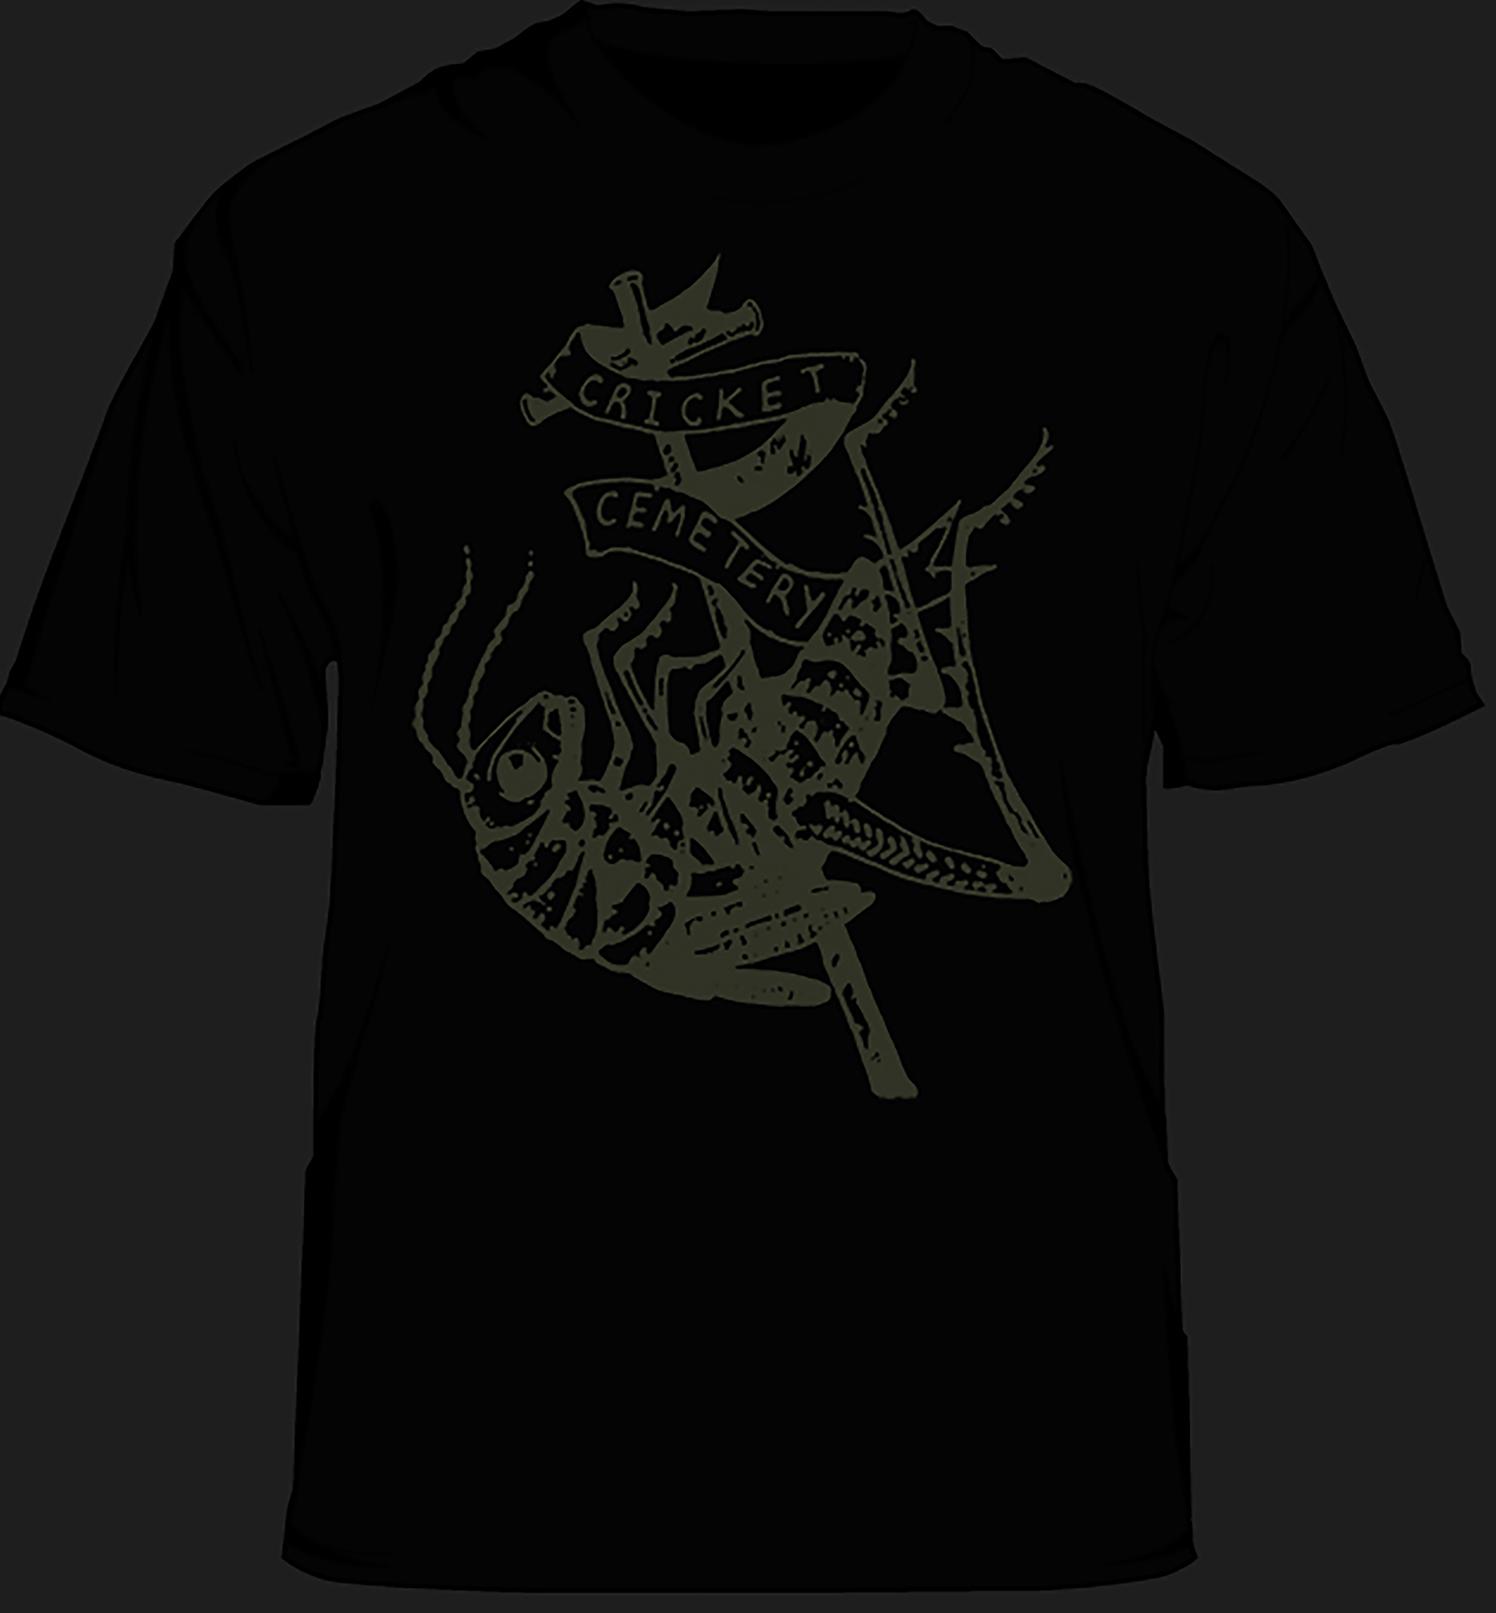 CRICKET CEMETERY - Glow in the Dark T Shirt · Cricket Cemetery ...